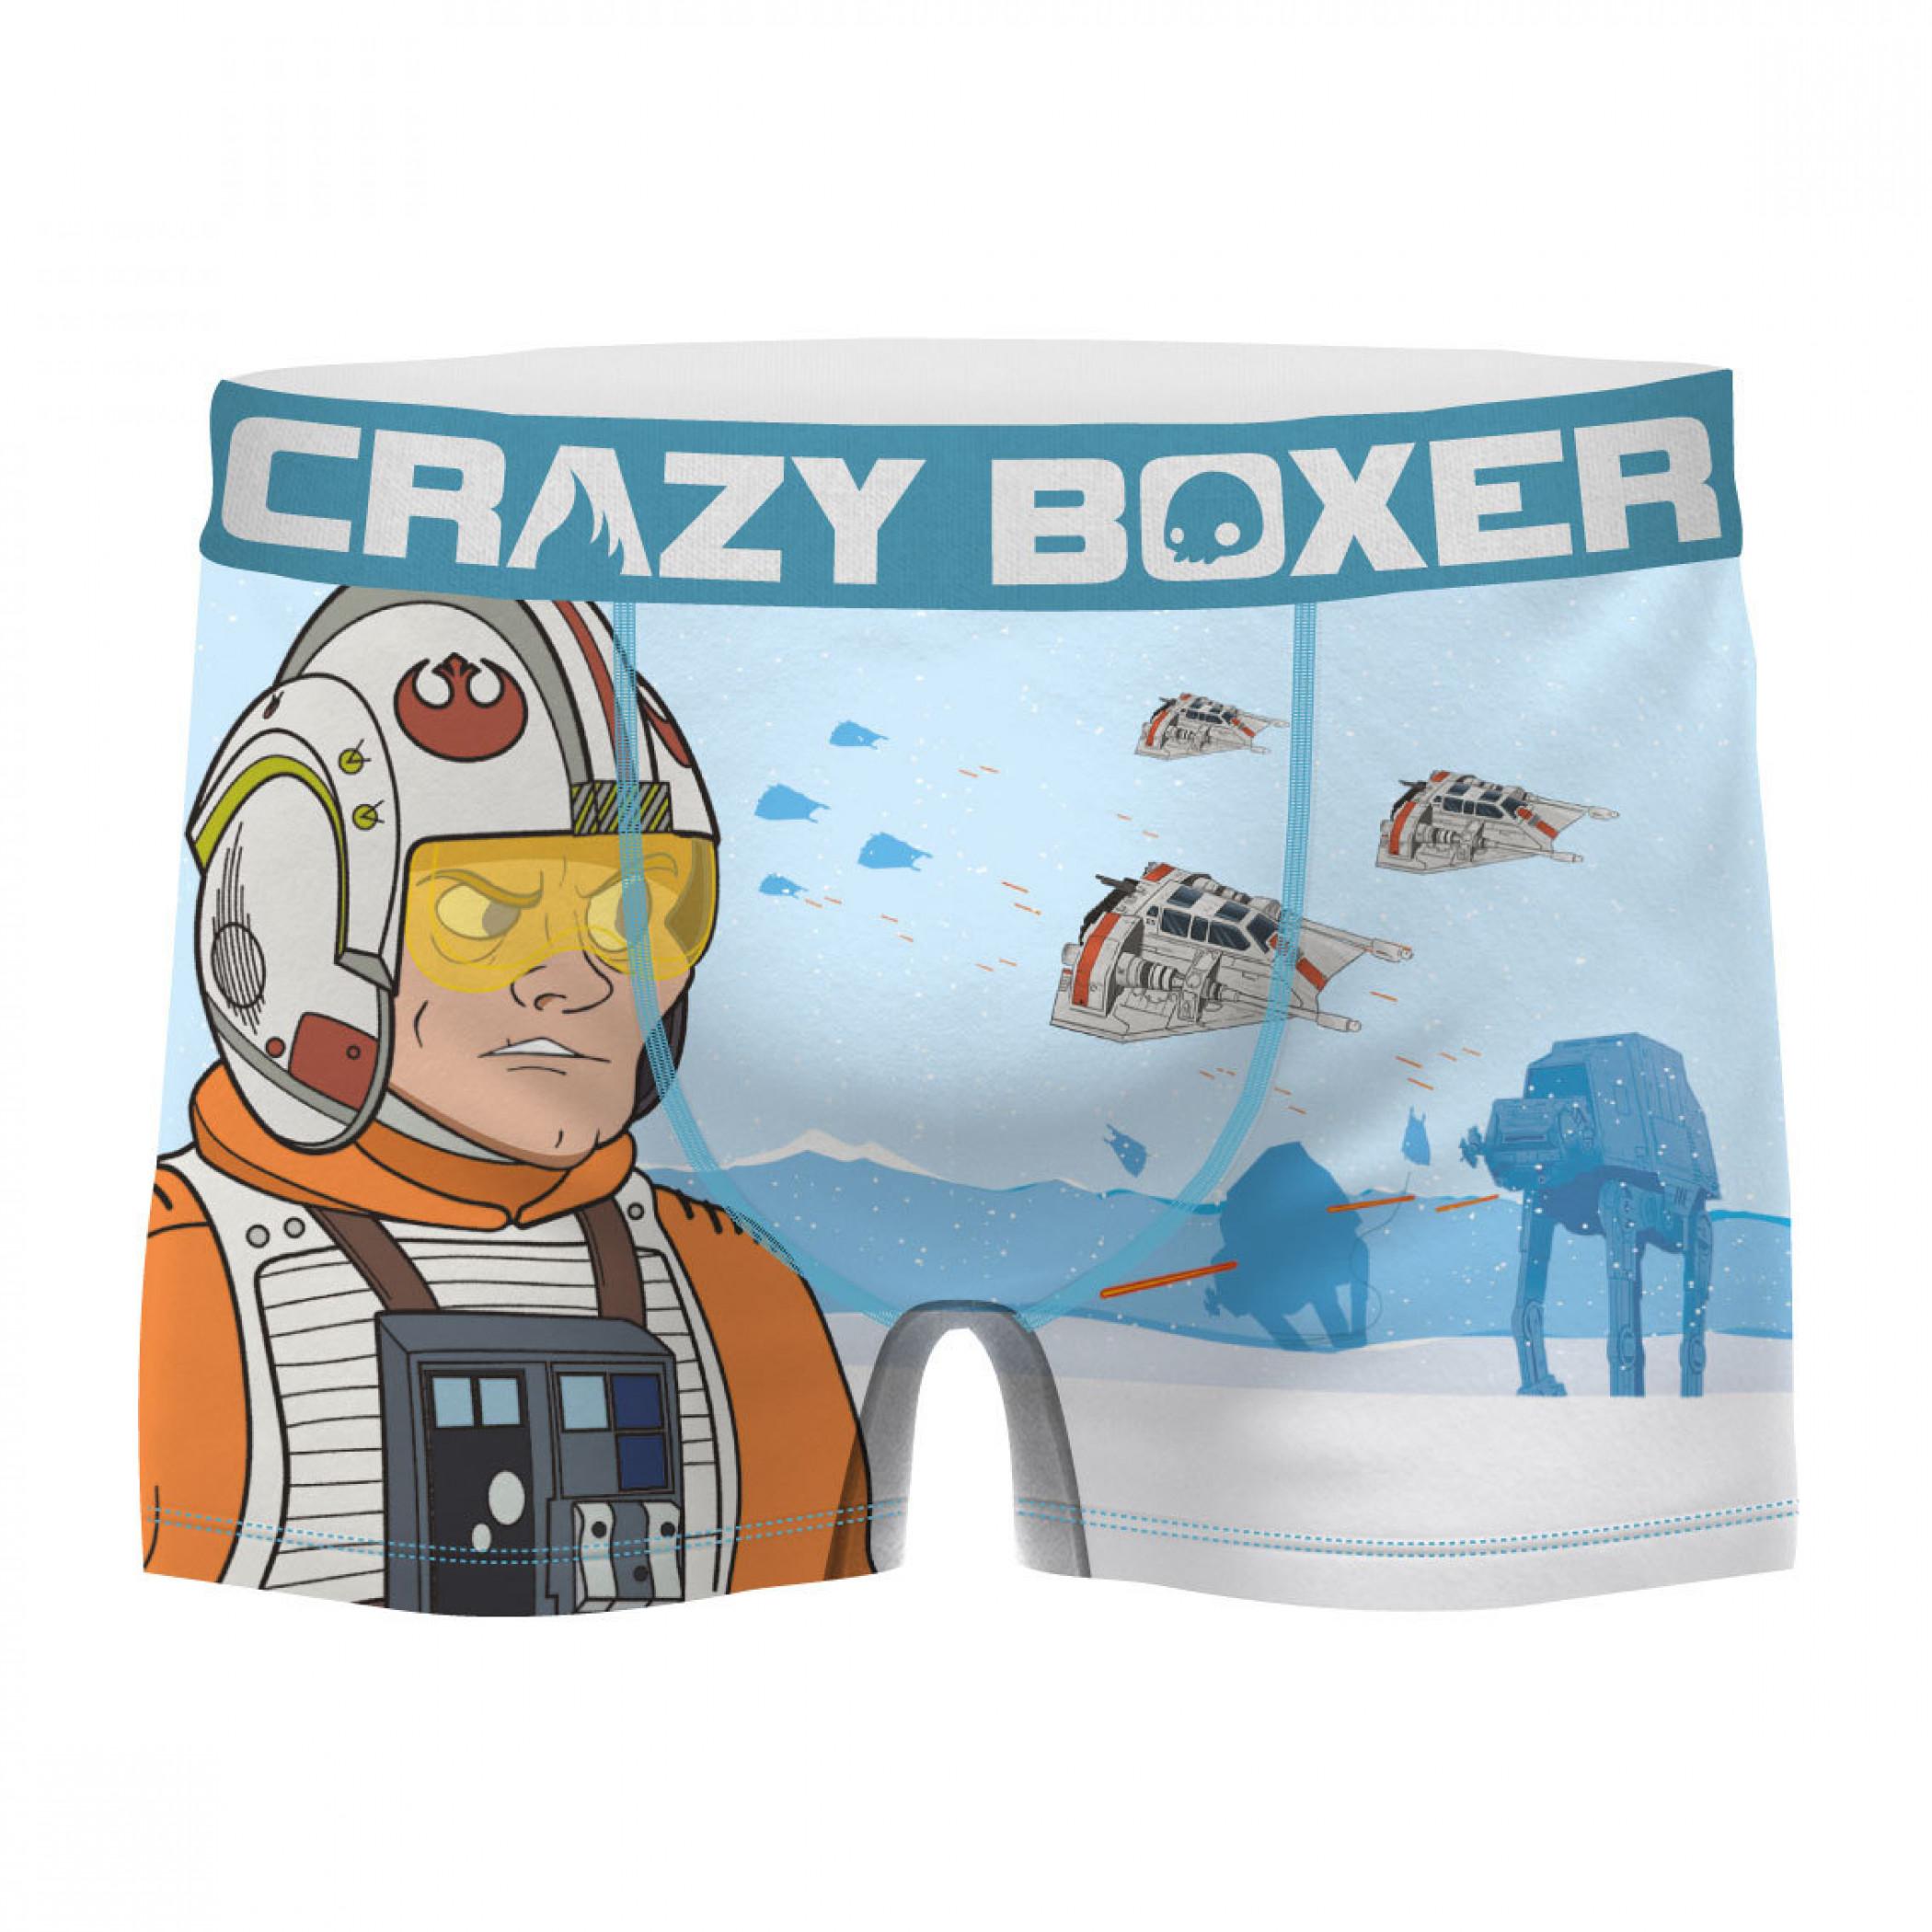 Star Wars Battle of Hoth Men's Boxer Briefs Shorts